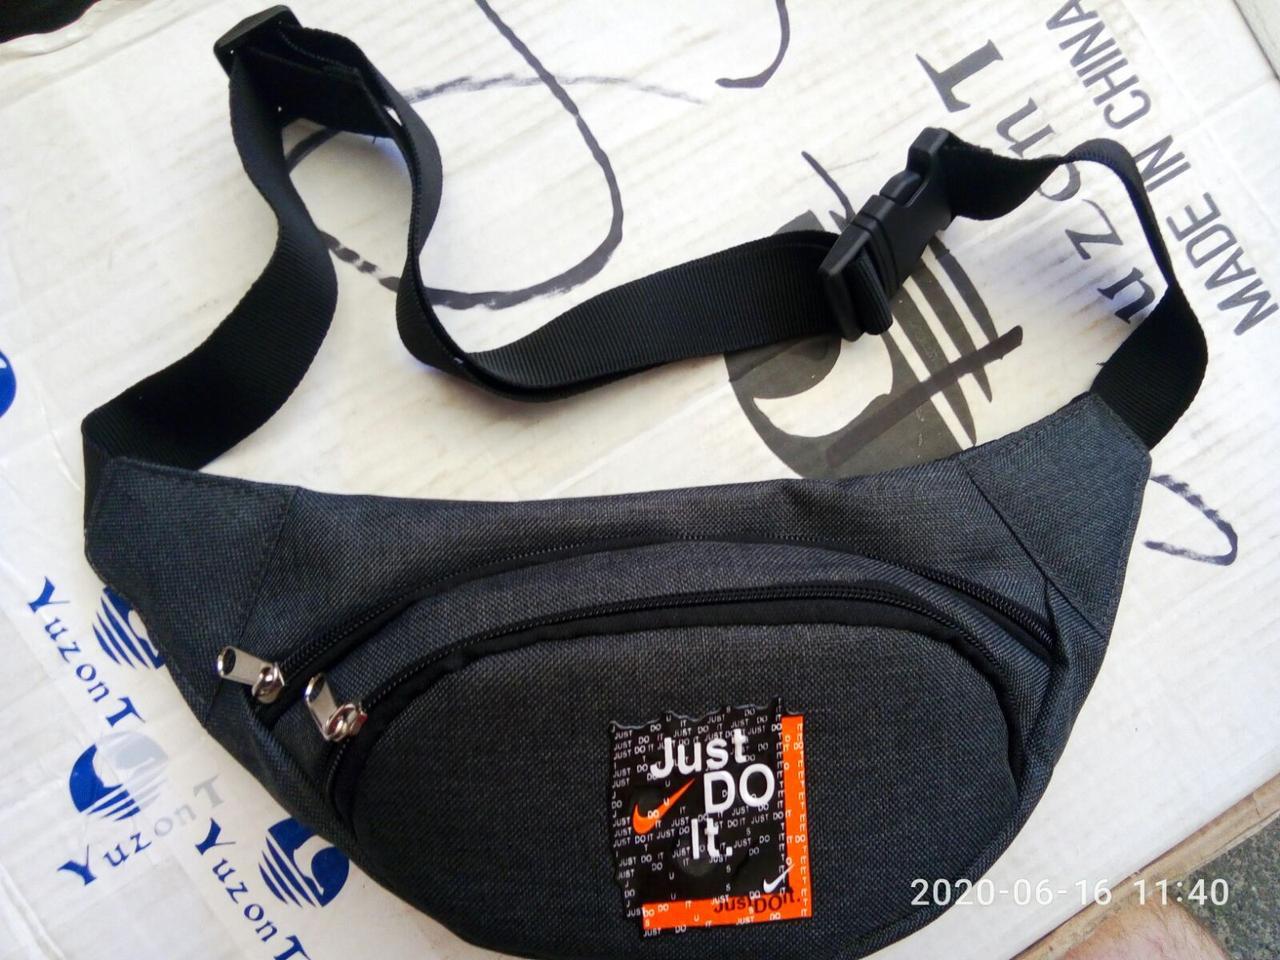 Поясная сумка Бананка Барсетка сумка на пояс мужская женская